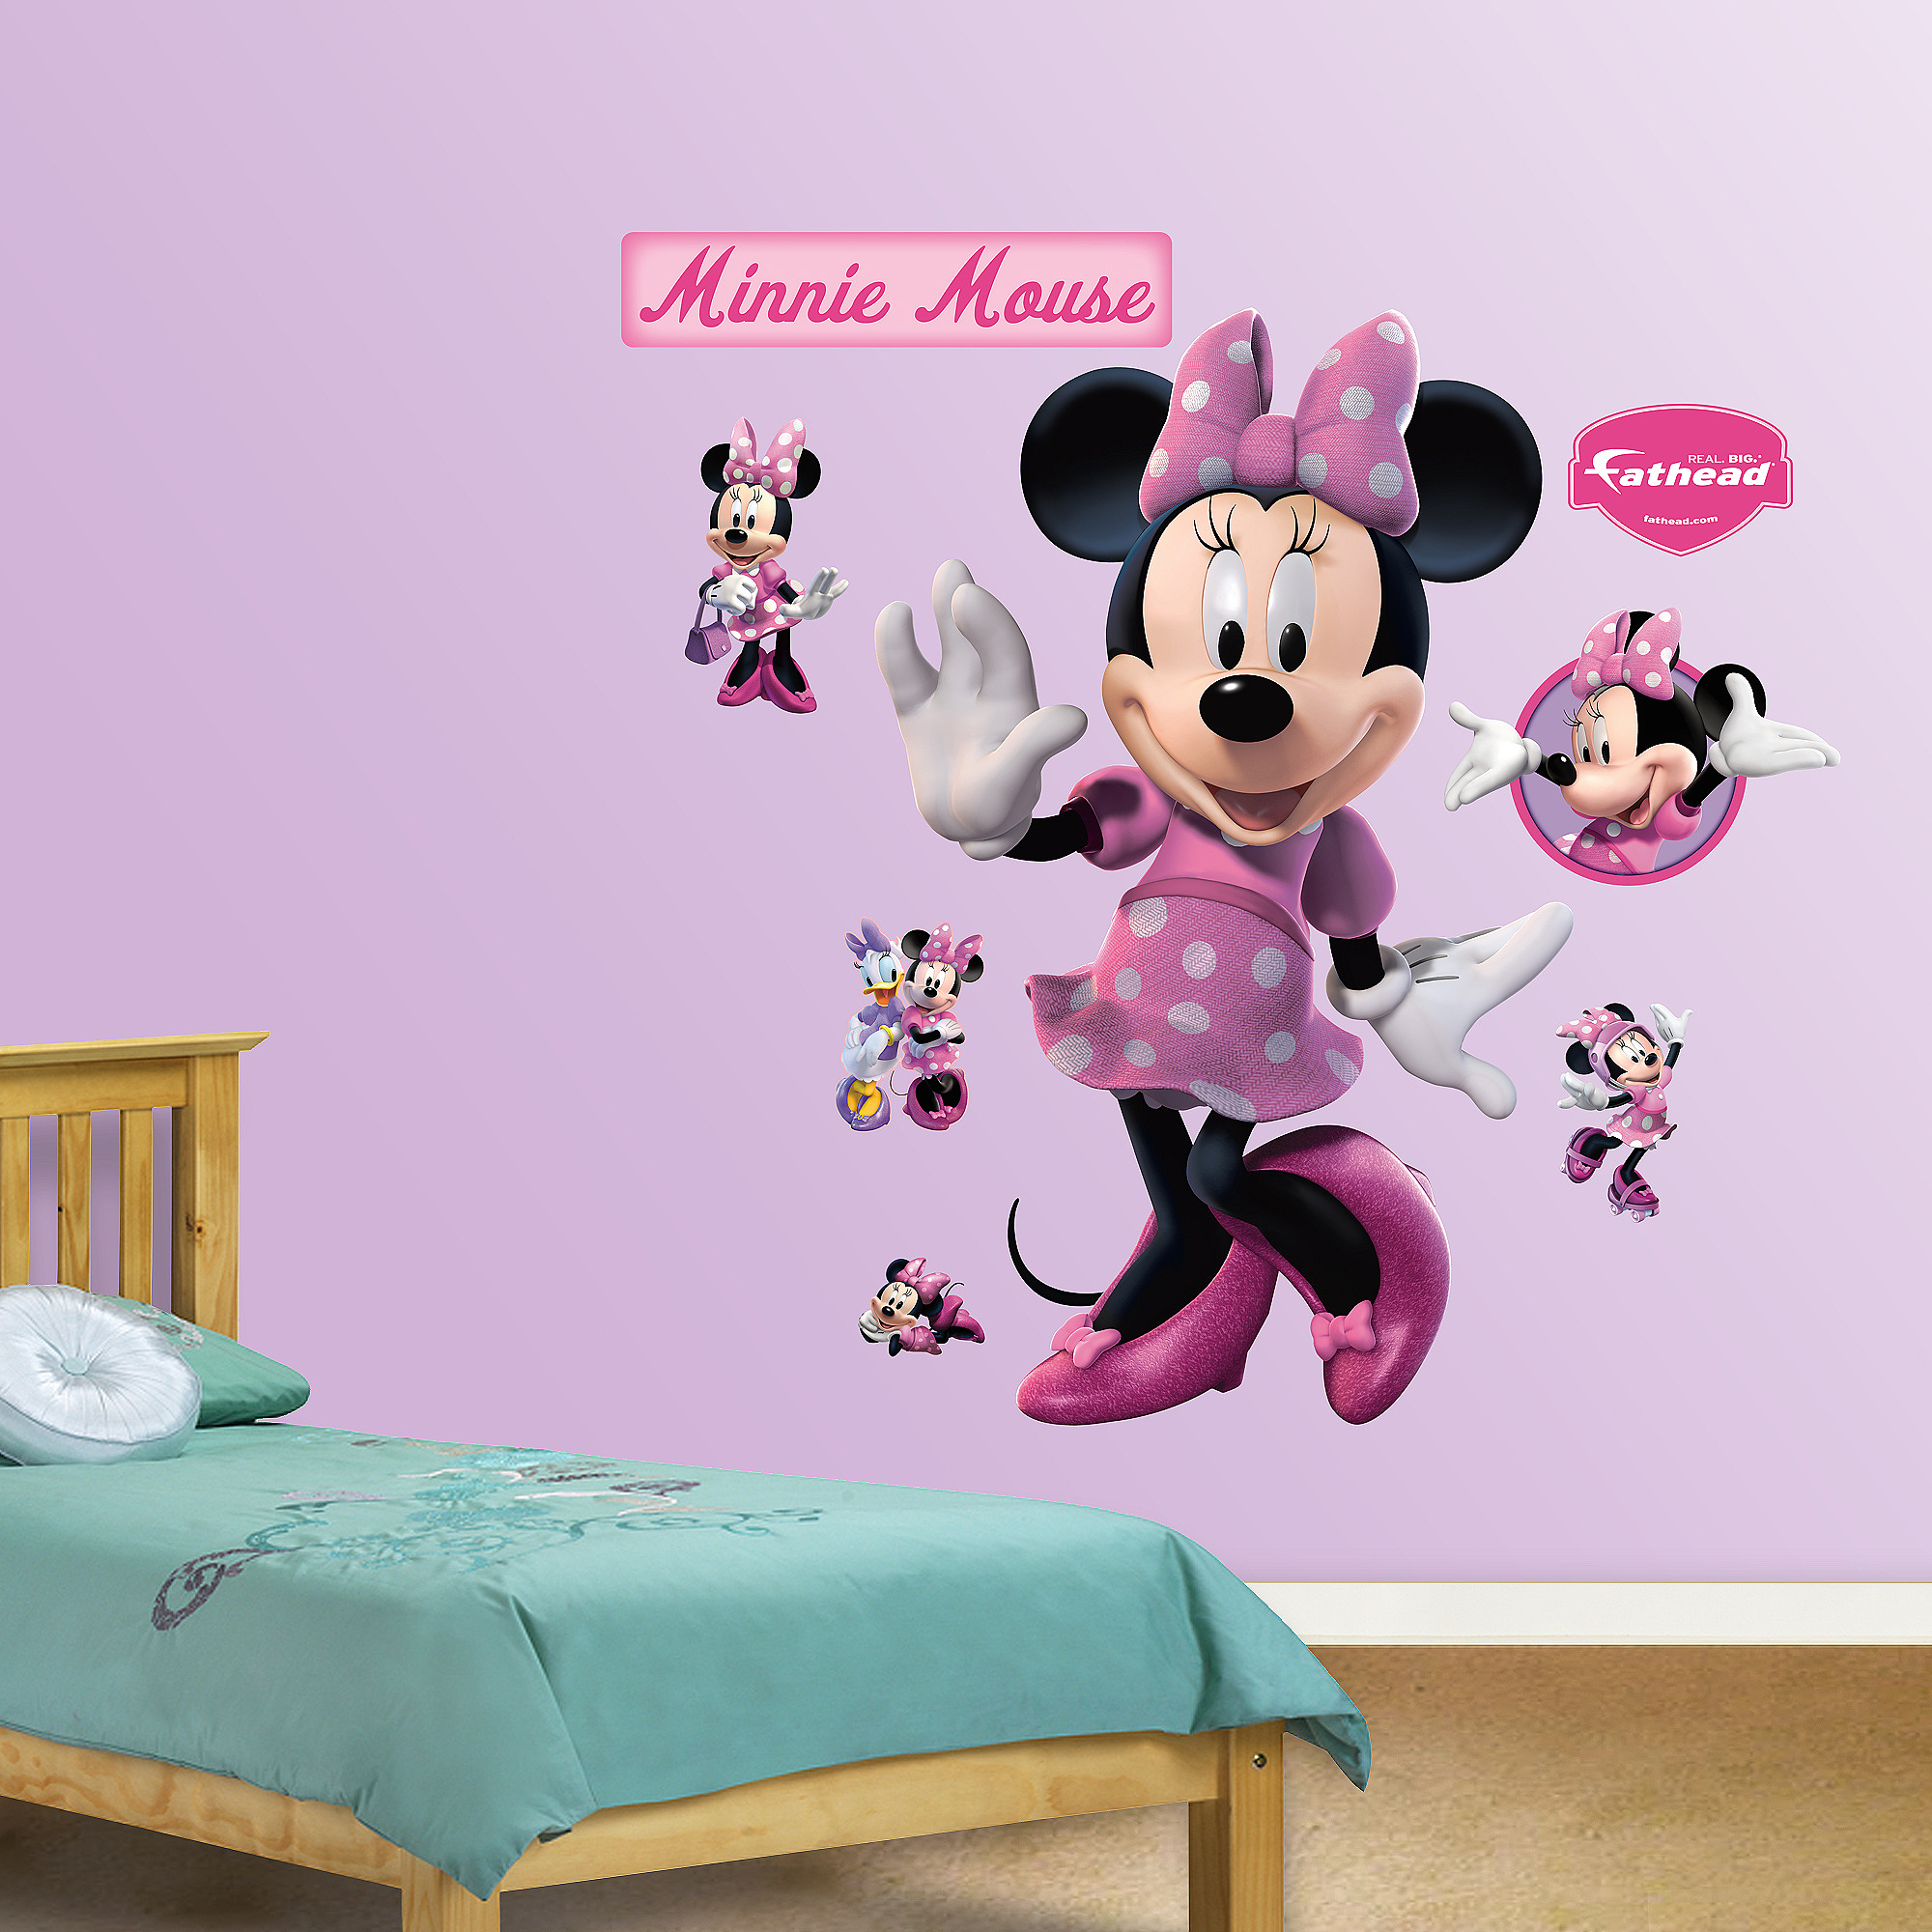 Minnie Mouse Fathead